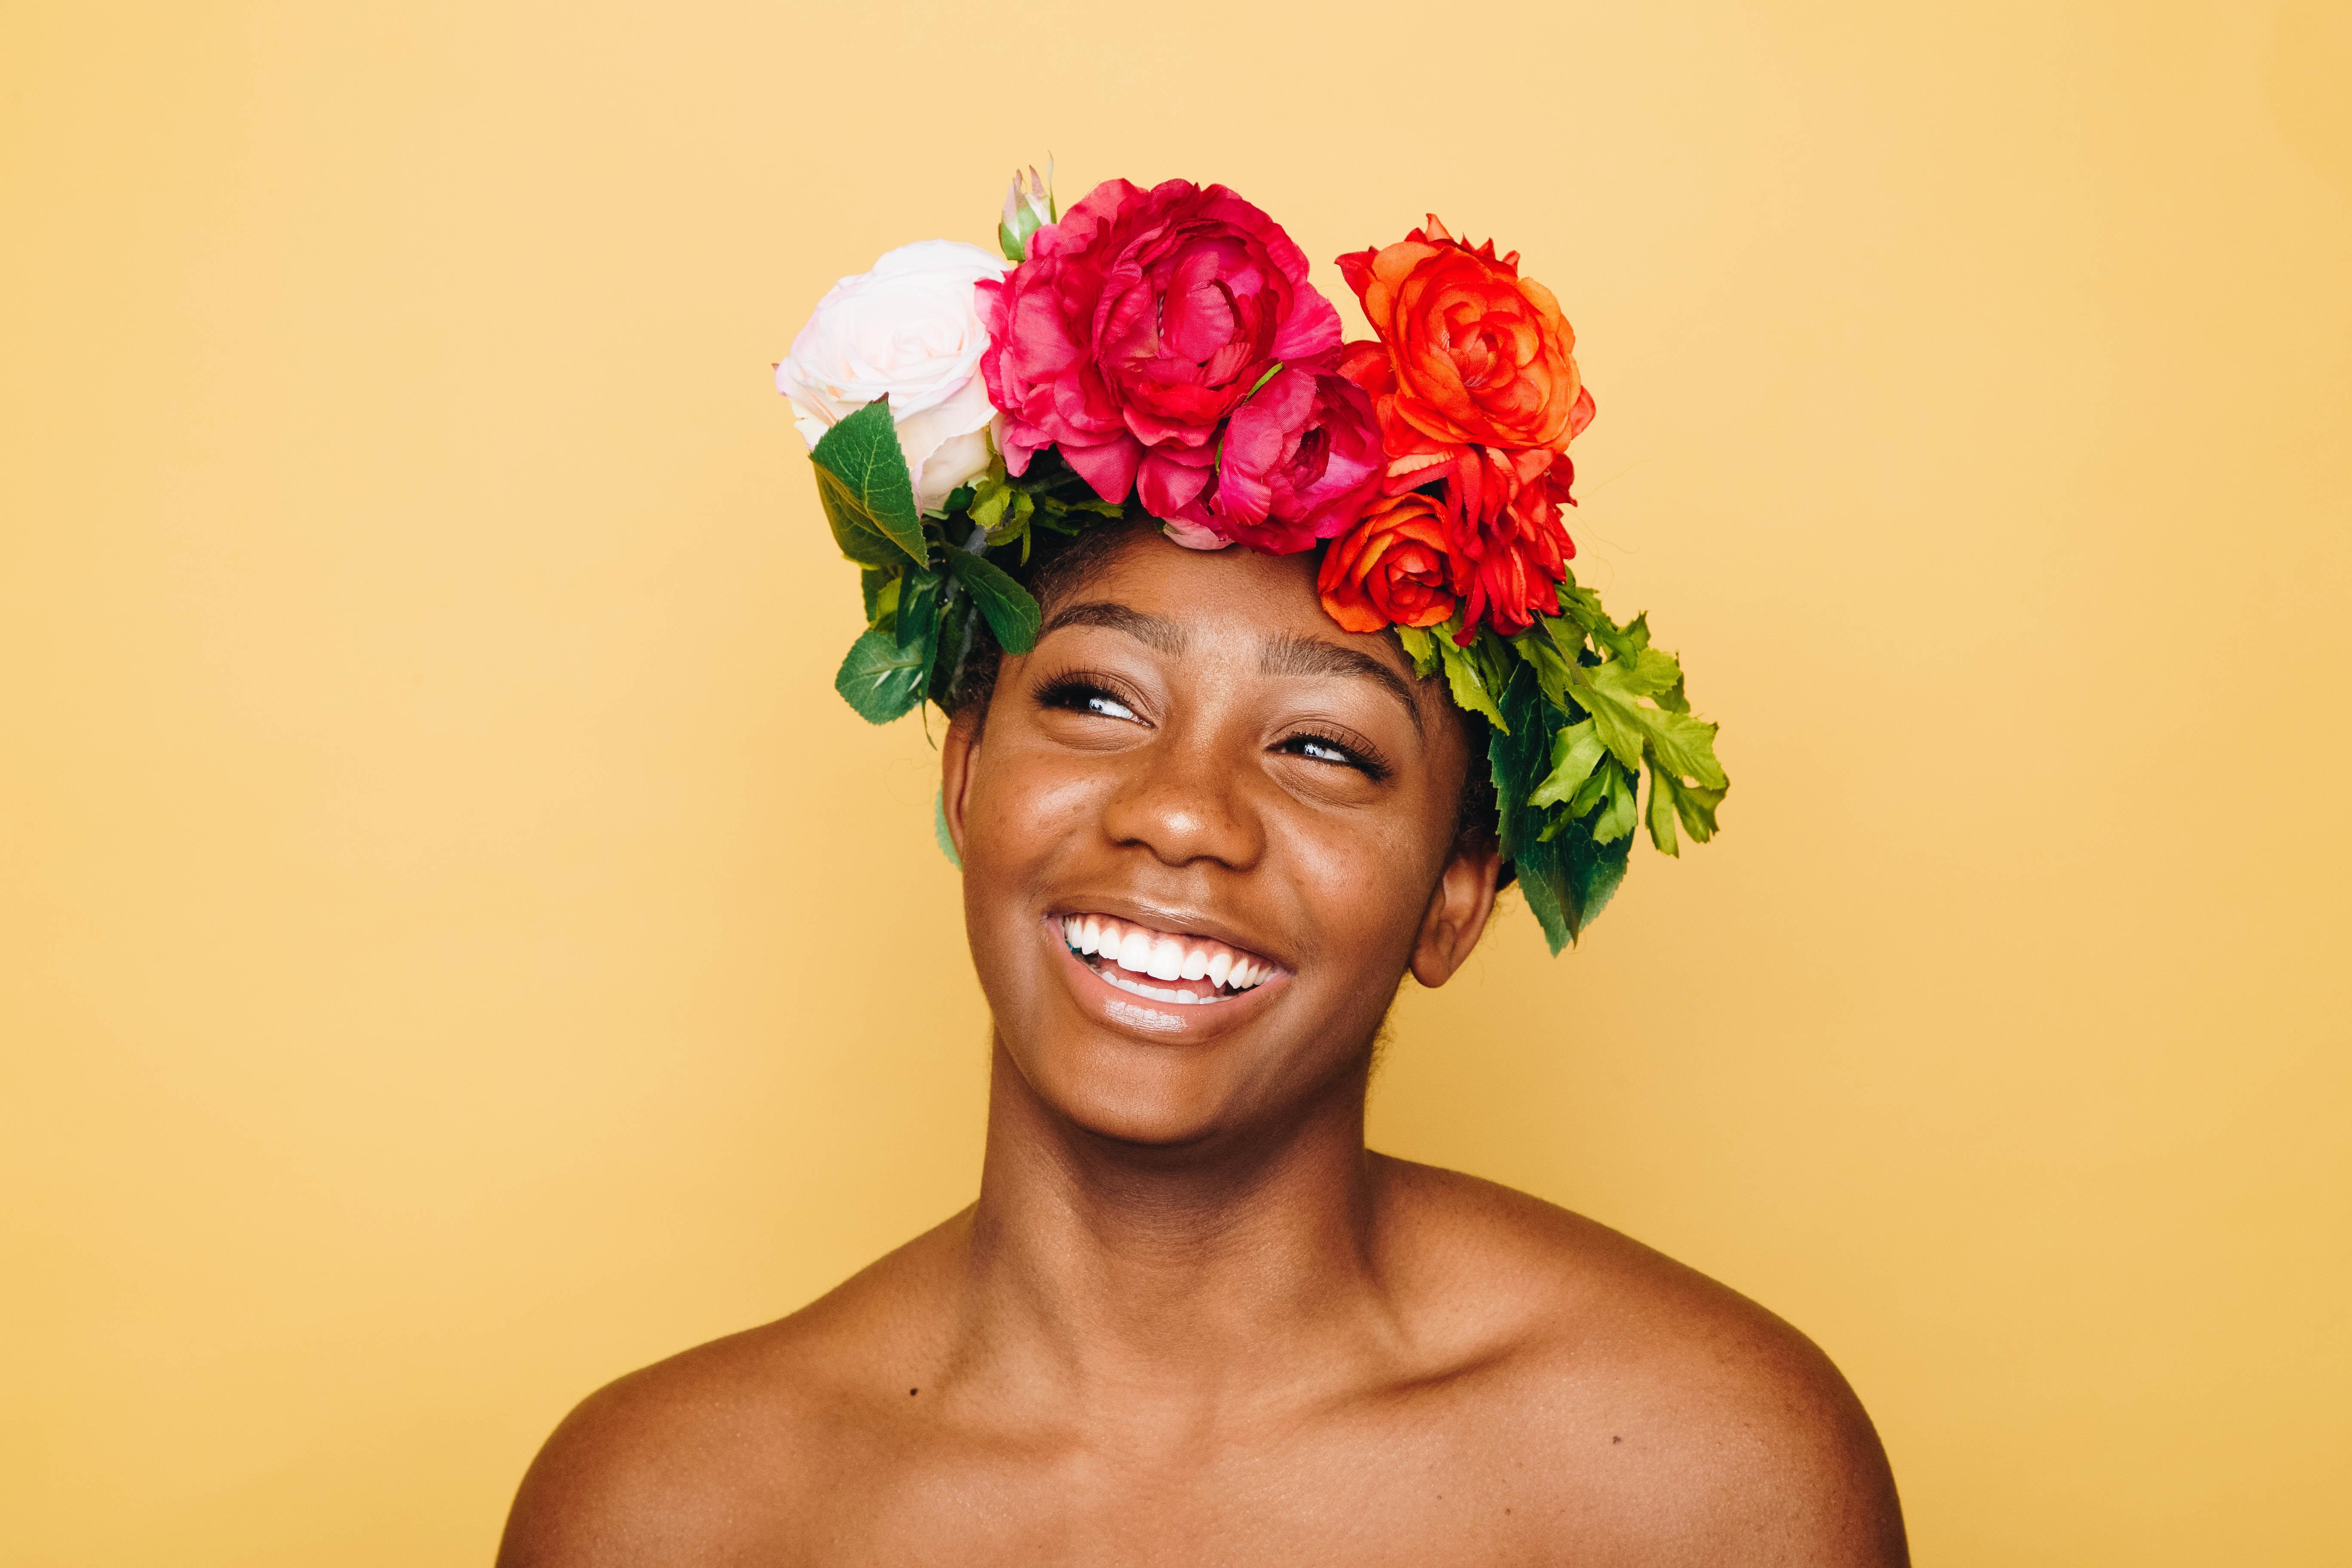 sonreir-mujer-sonrisa